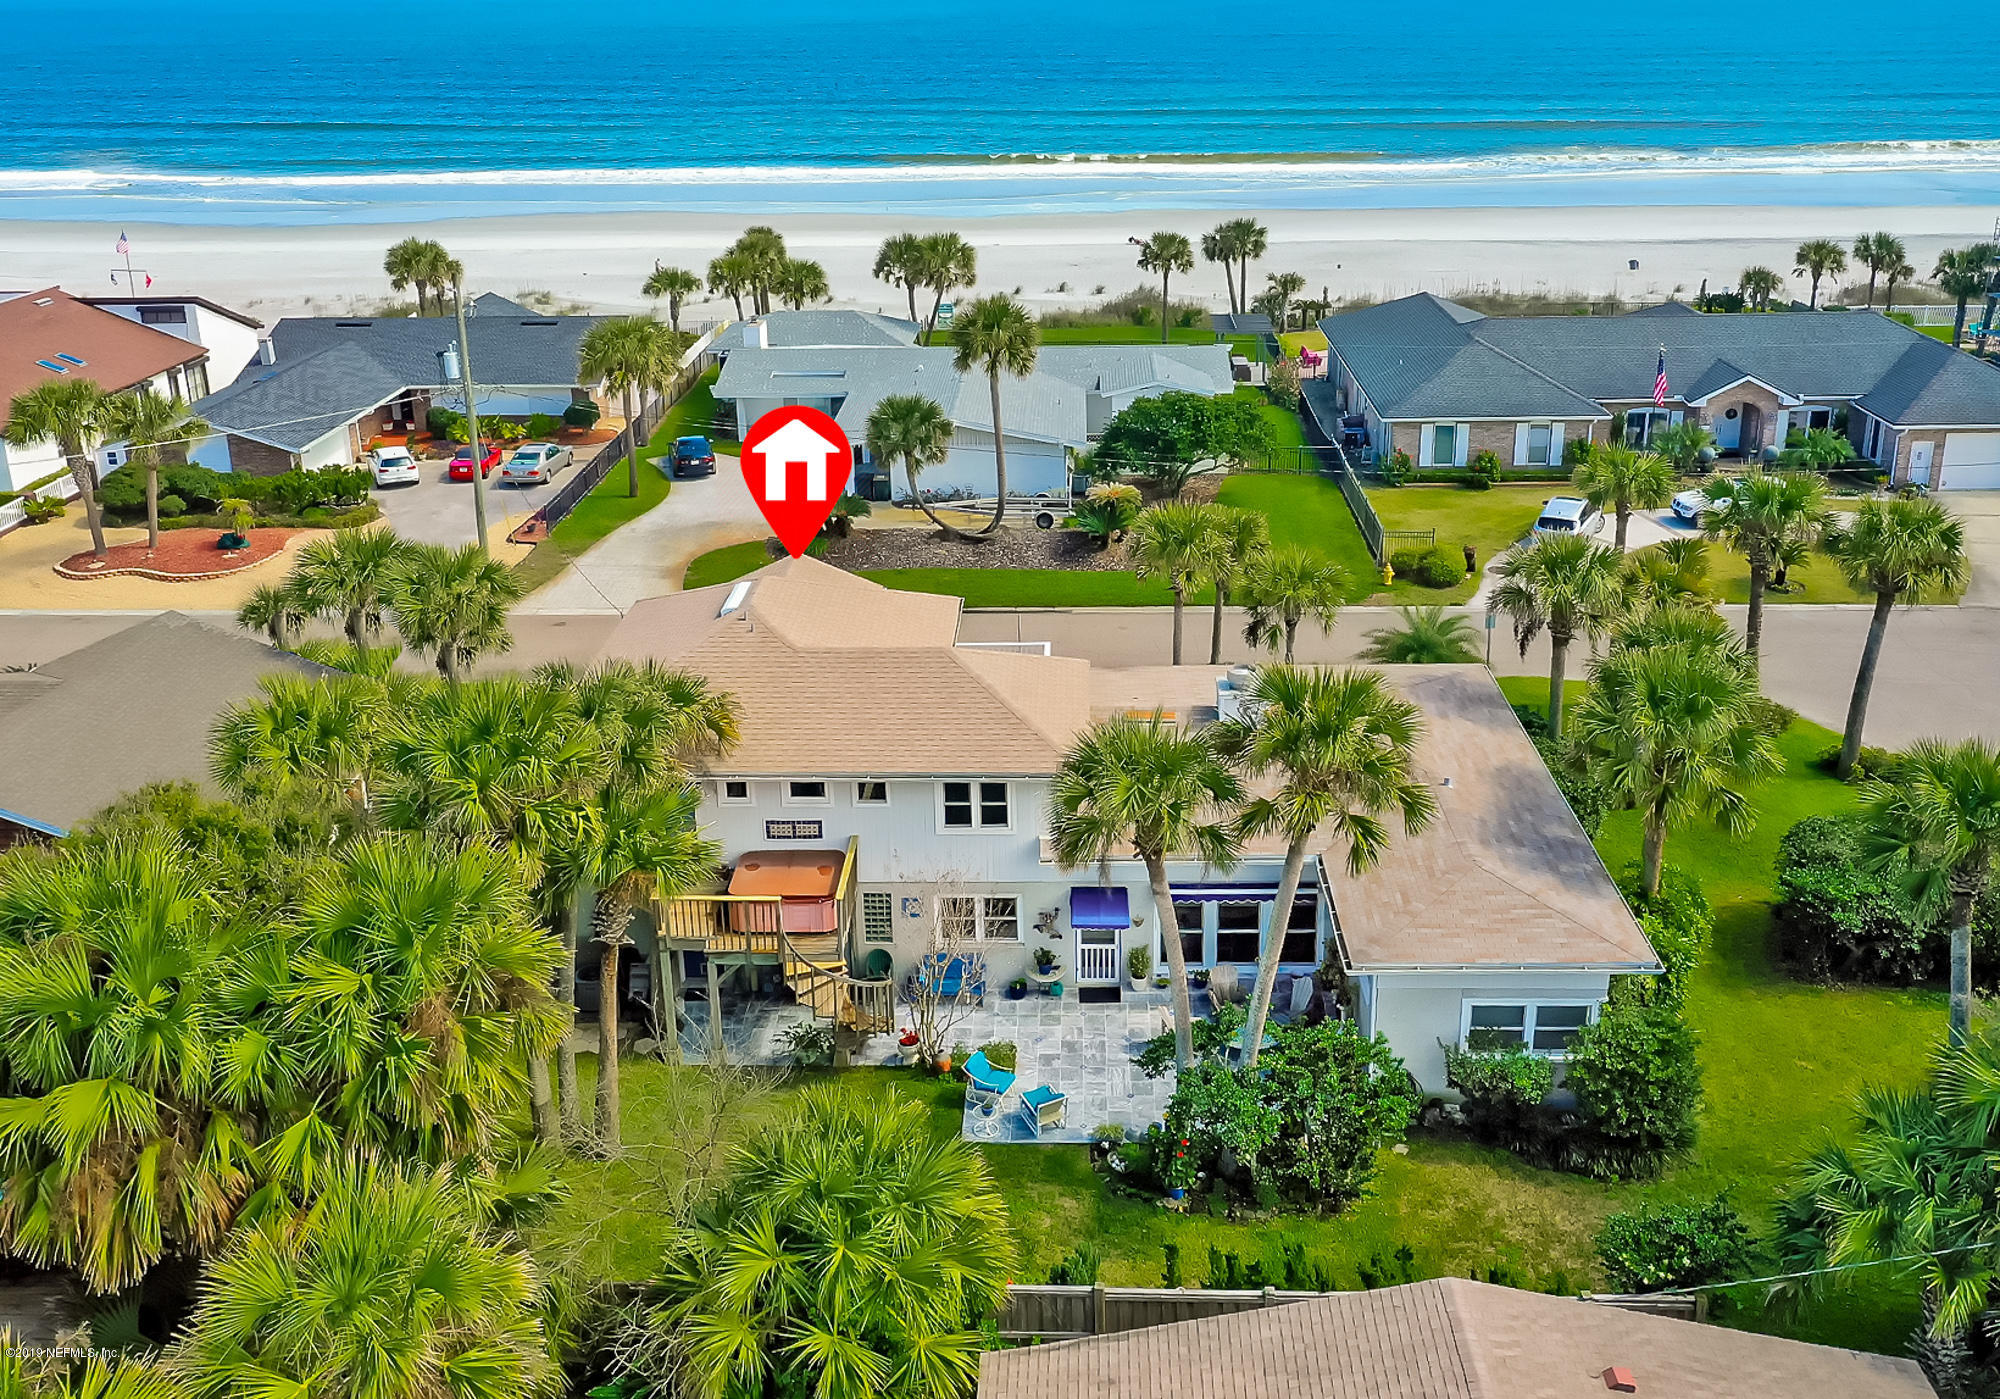 830 BEACH, ATLANTIC BEACH, FLORIDA 32233, 3 Bedrooms Bedrooms, ,3 BathroomsBathrooms,Residential - single family,For sale,BEACH,982722